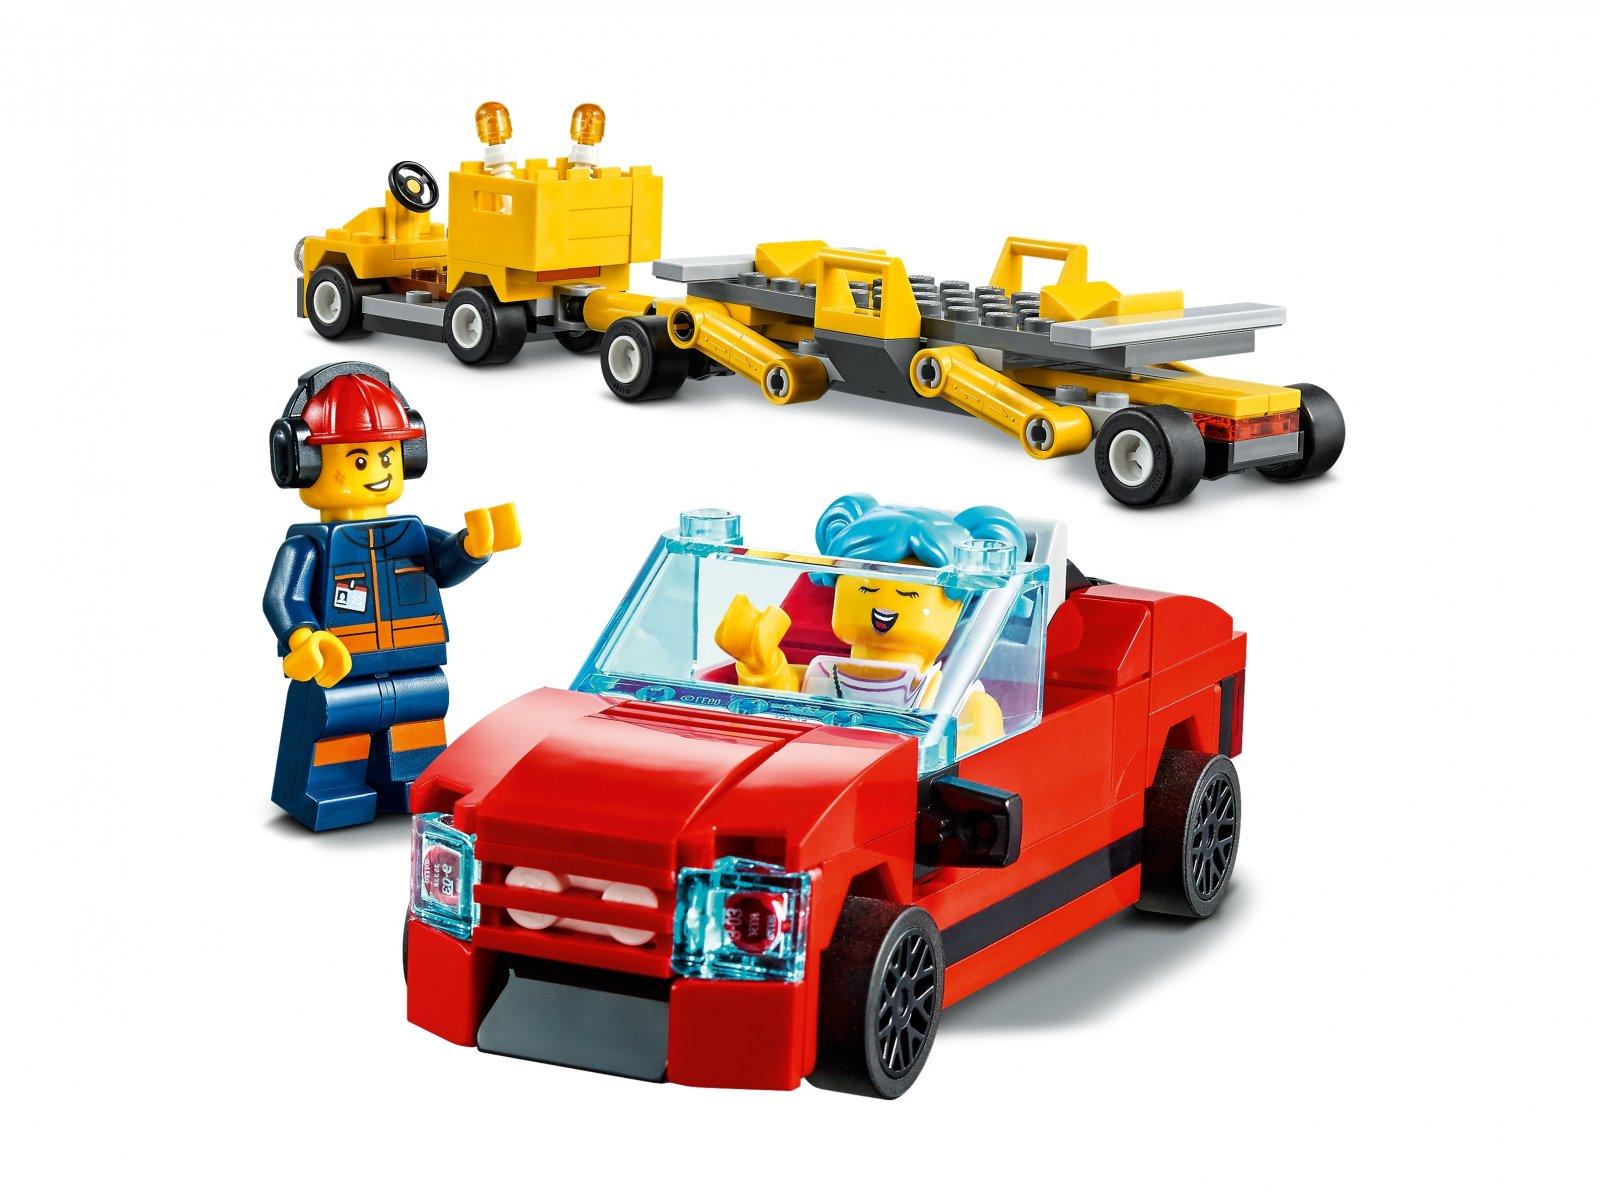 LEGO City Samolot pasażerski 60262